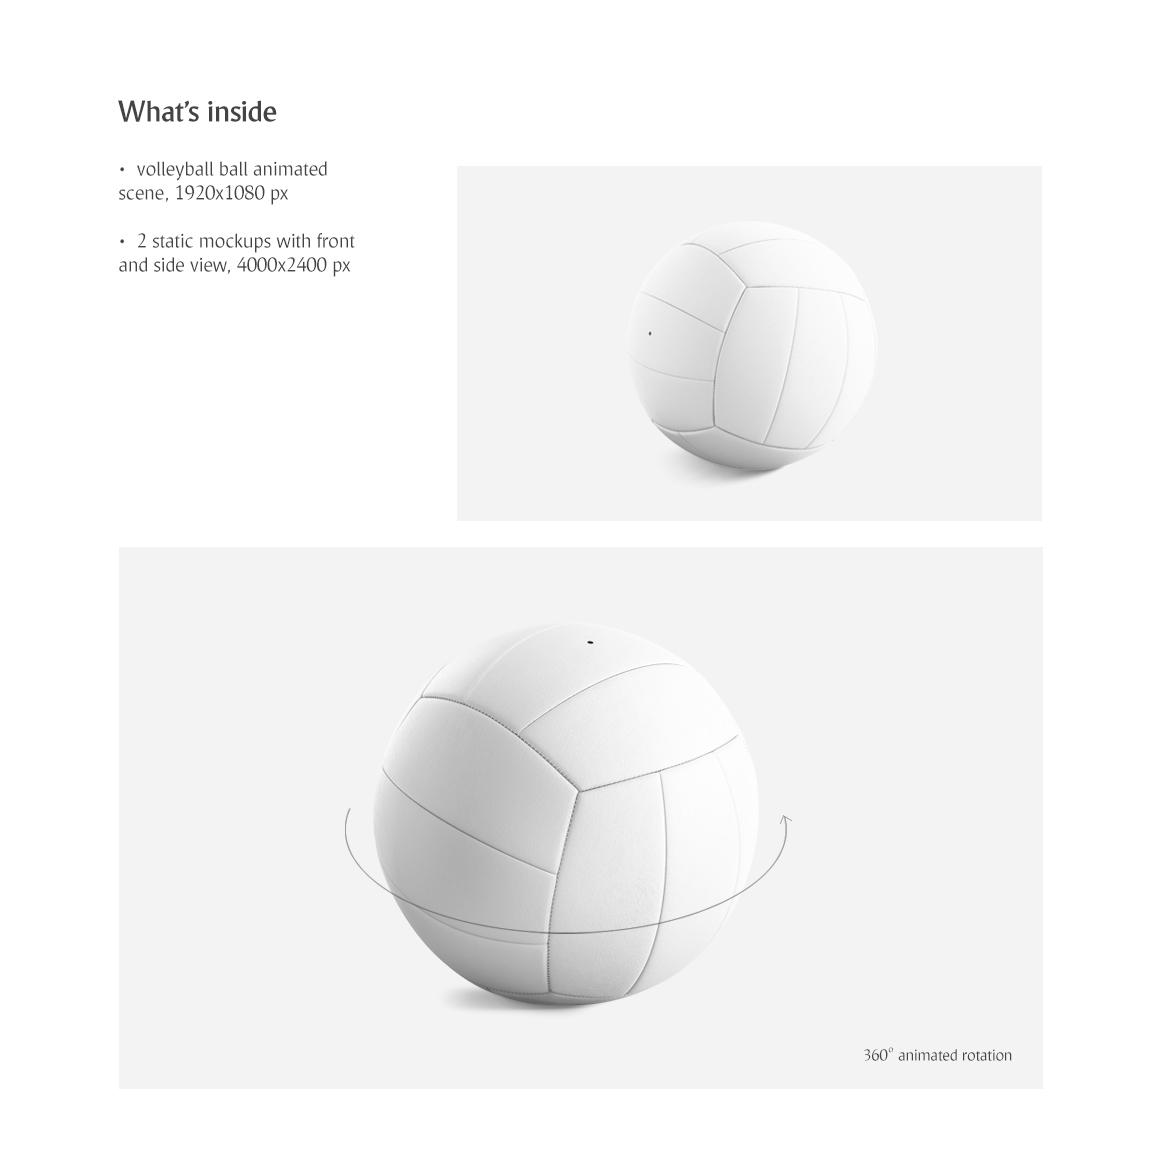 Volleyball Ball Animated Mockup example image 4